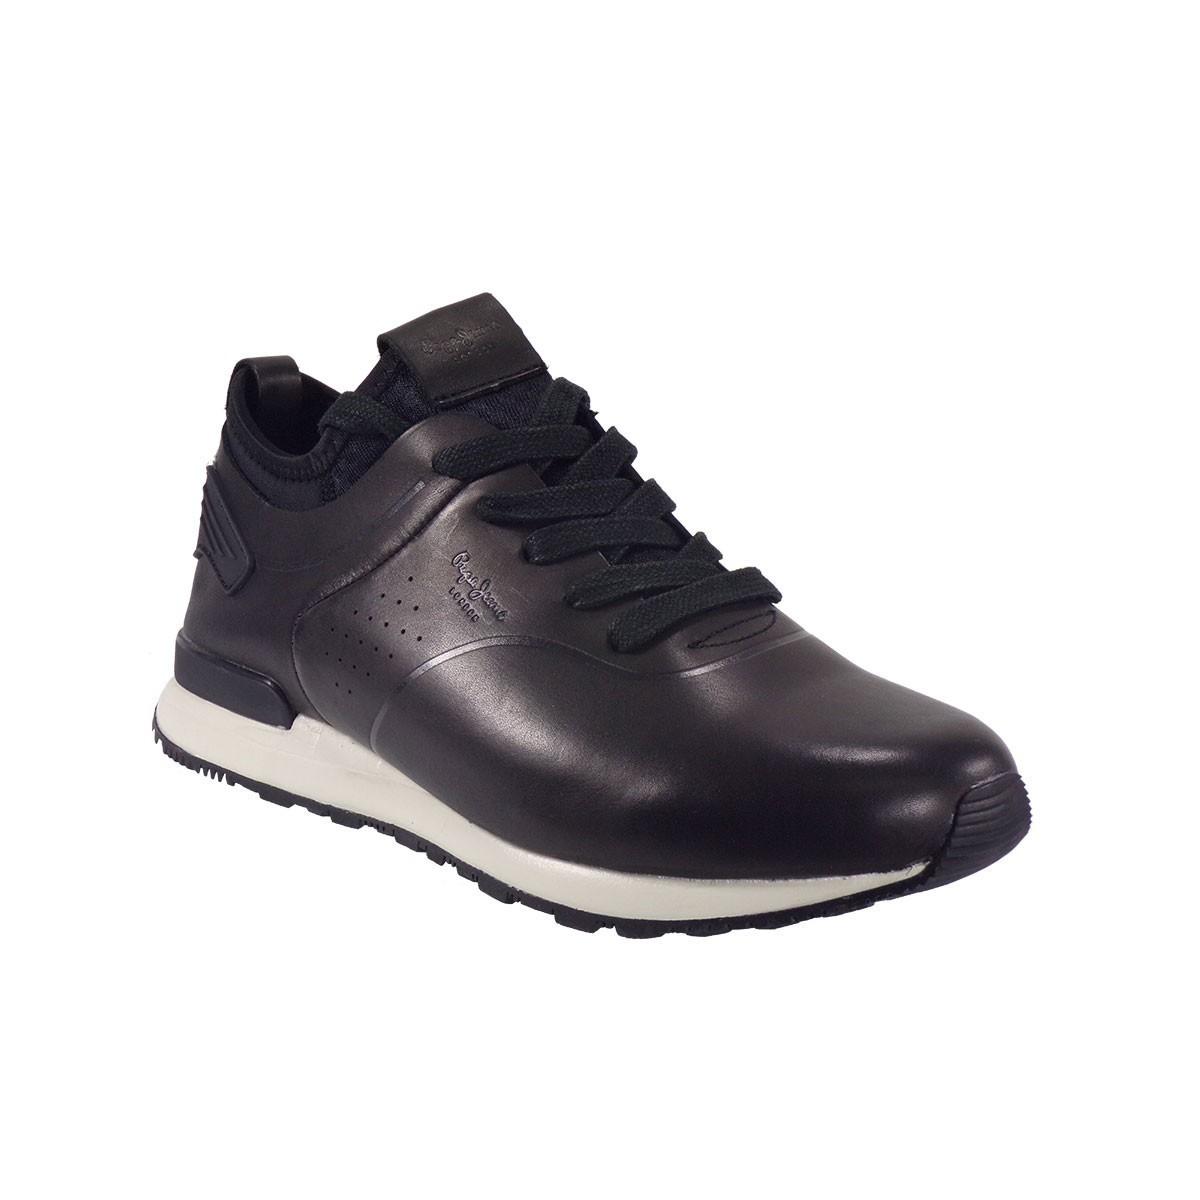 20b9908881 Pepe Jeans BOSTON SMART Sneakers Ανδρικά Παπούτσια PMS30477-999 ...